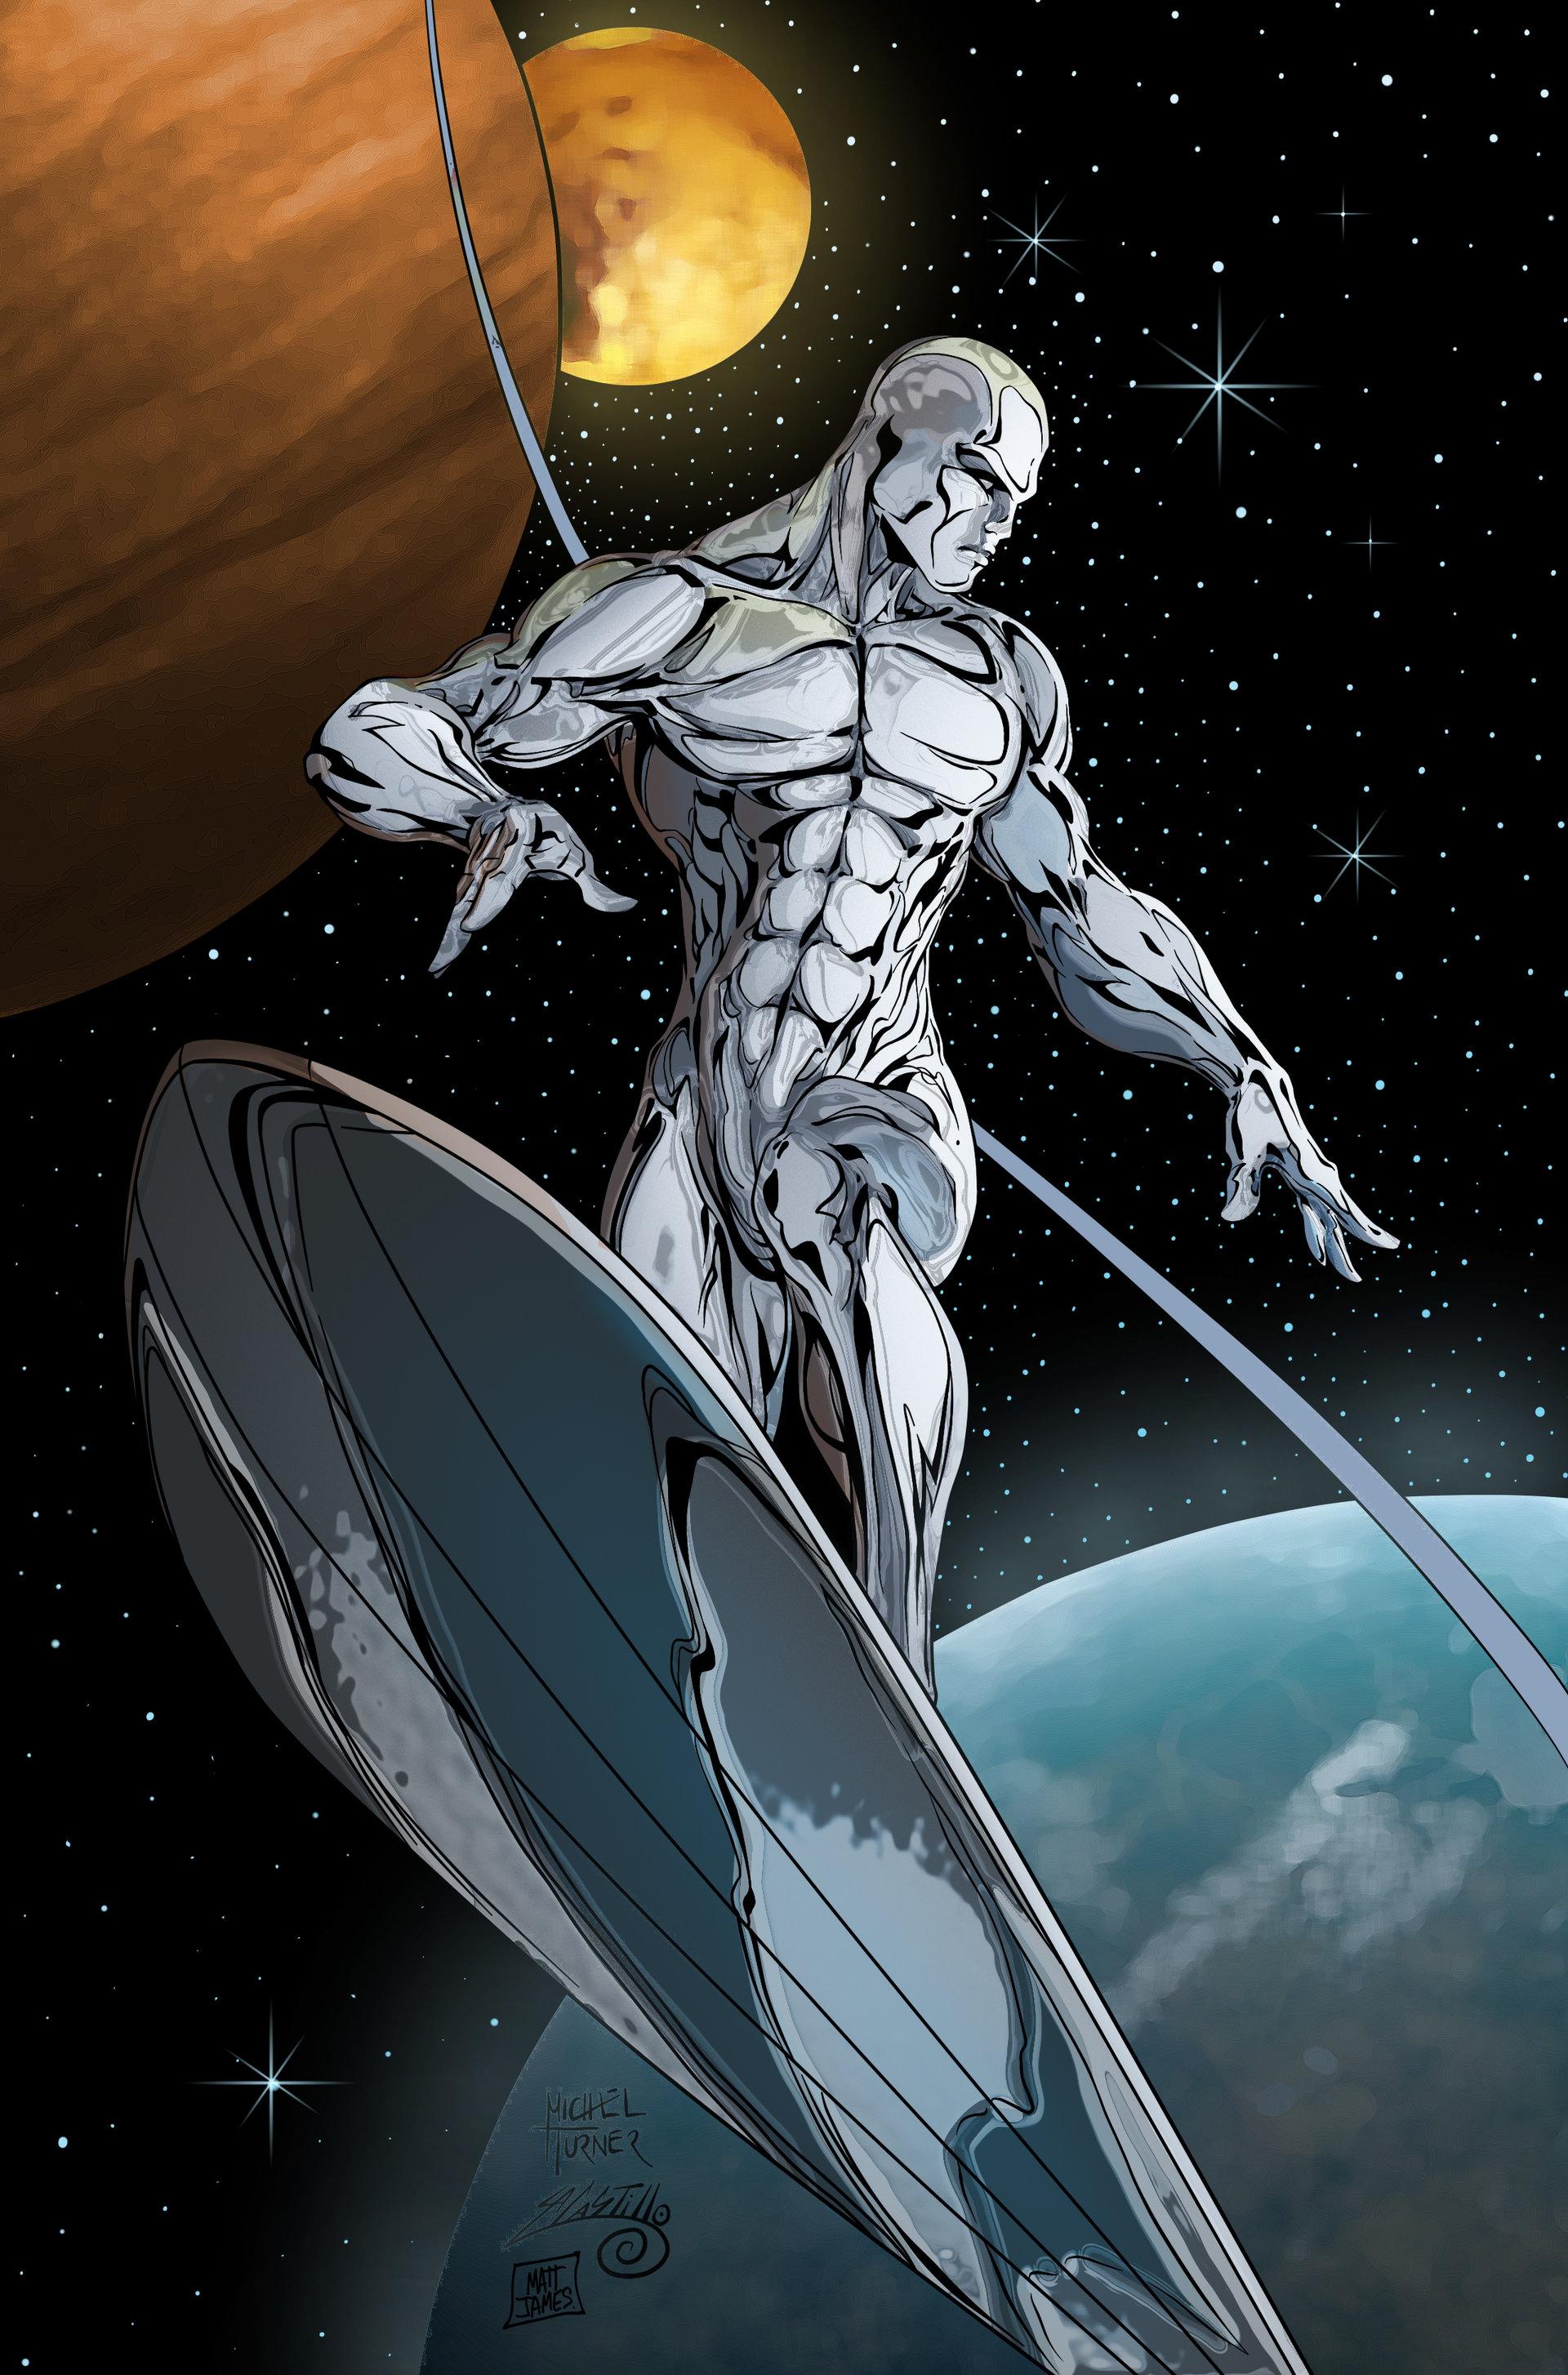 Matt james silver surfer ink by swave18 flat carloscampos by carloscamposart d8wvvun